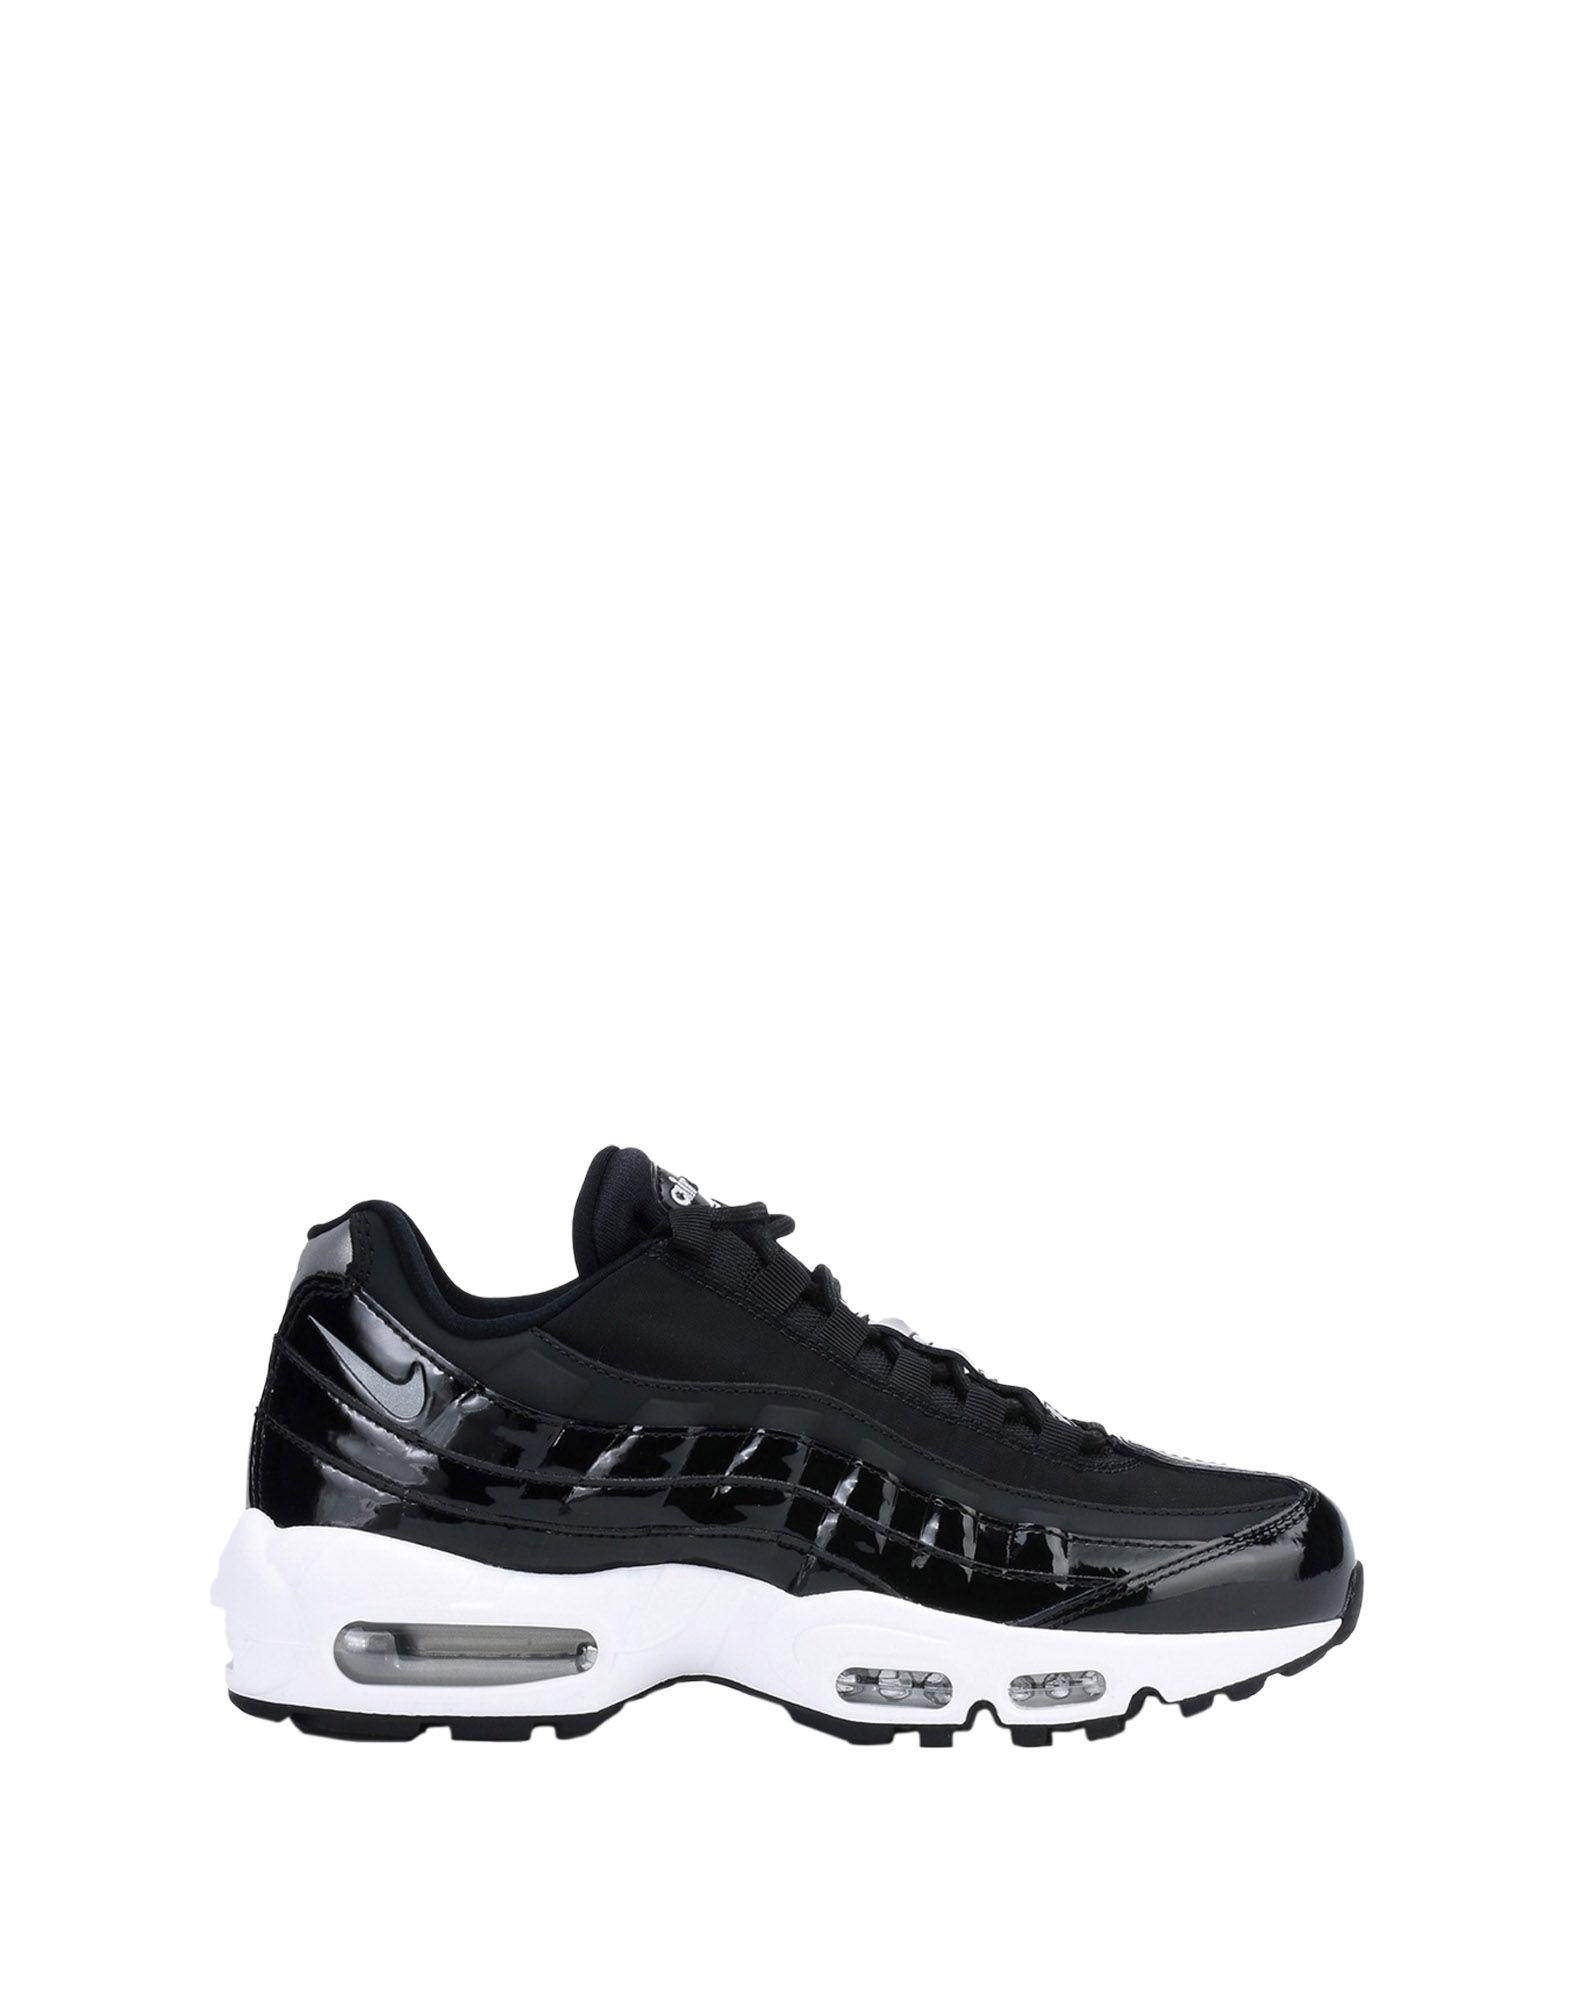 2b0f5872f90fb ... Sneakers Nike Wmns Air Max 95 Se Prm - Femme - Sneakers Nike sur ...